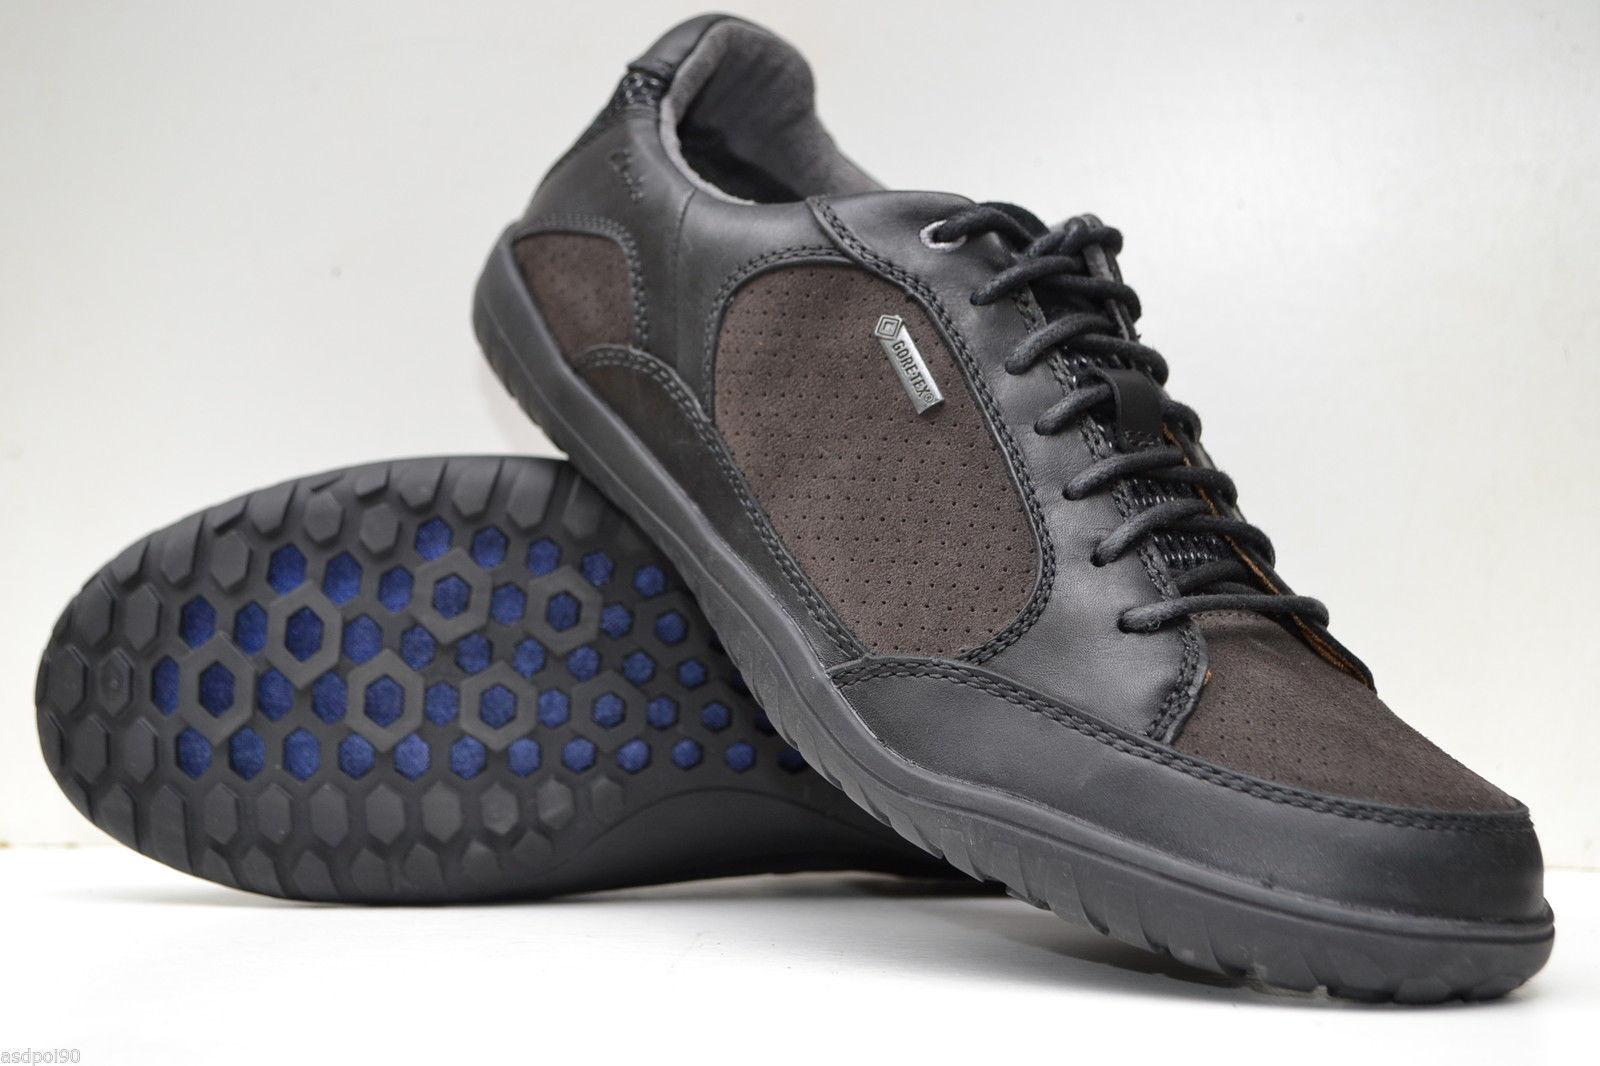 Clarks Men   REVITE FLOW GTX  Men BLACK COMBI  Blau SOLE  UK 6,7,8,9,10,11 G 1fe09e